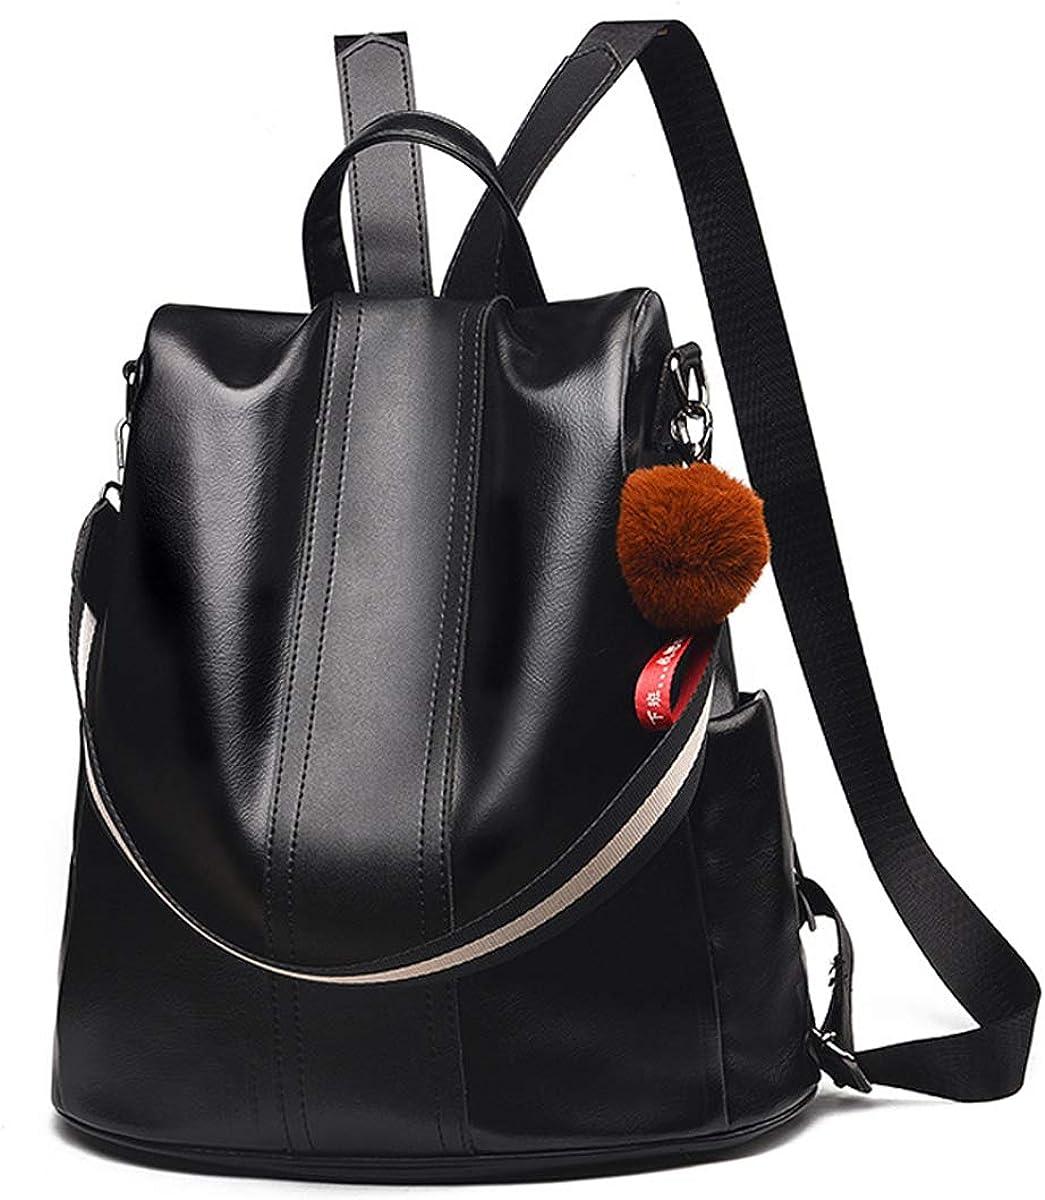 NICOLE DORIS Backpack Women Casual rucksack Waterproof Fashion Backpack for ladies large capacity anti-theft shoulder bag